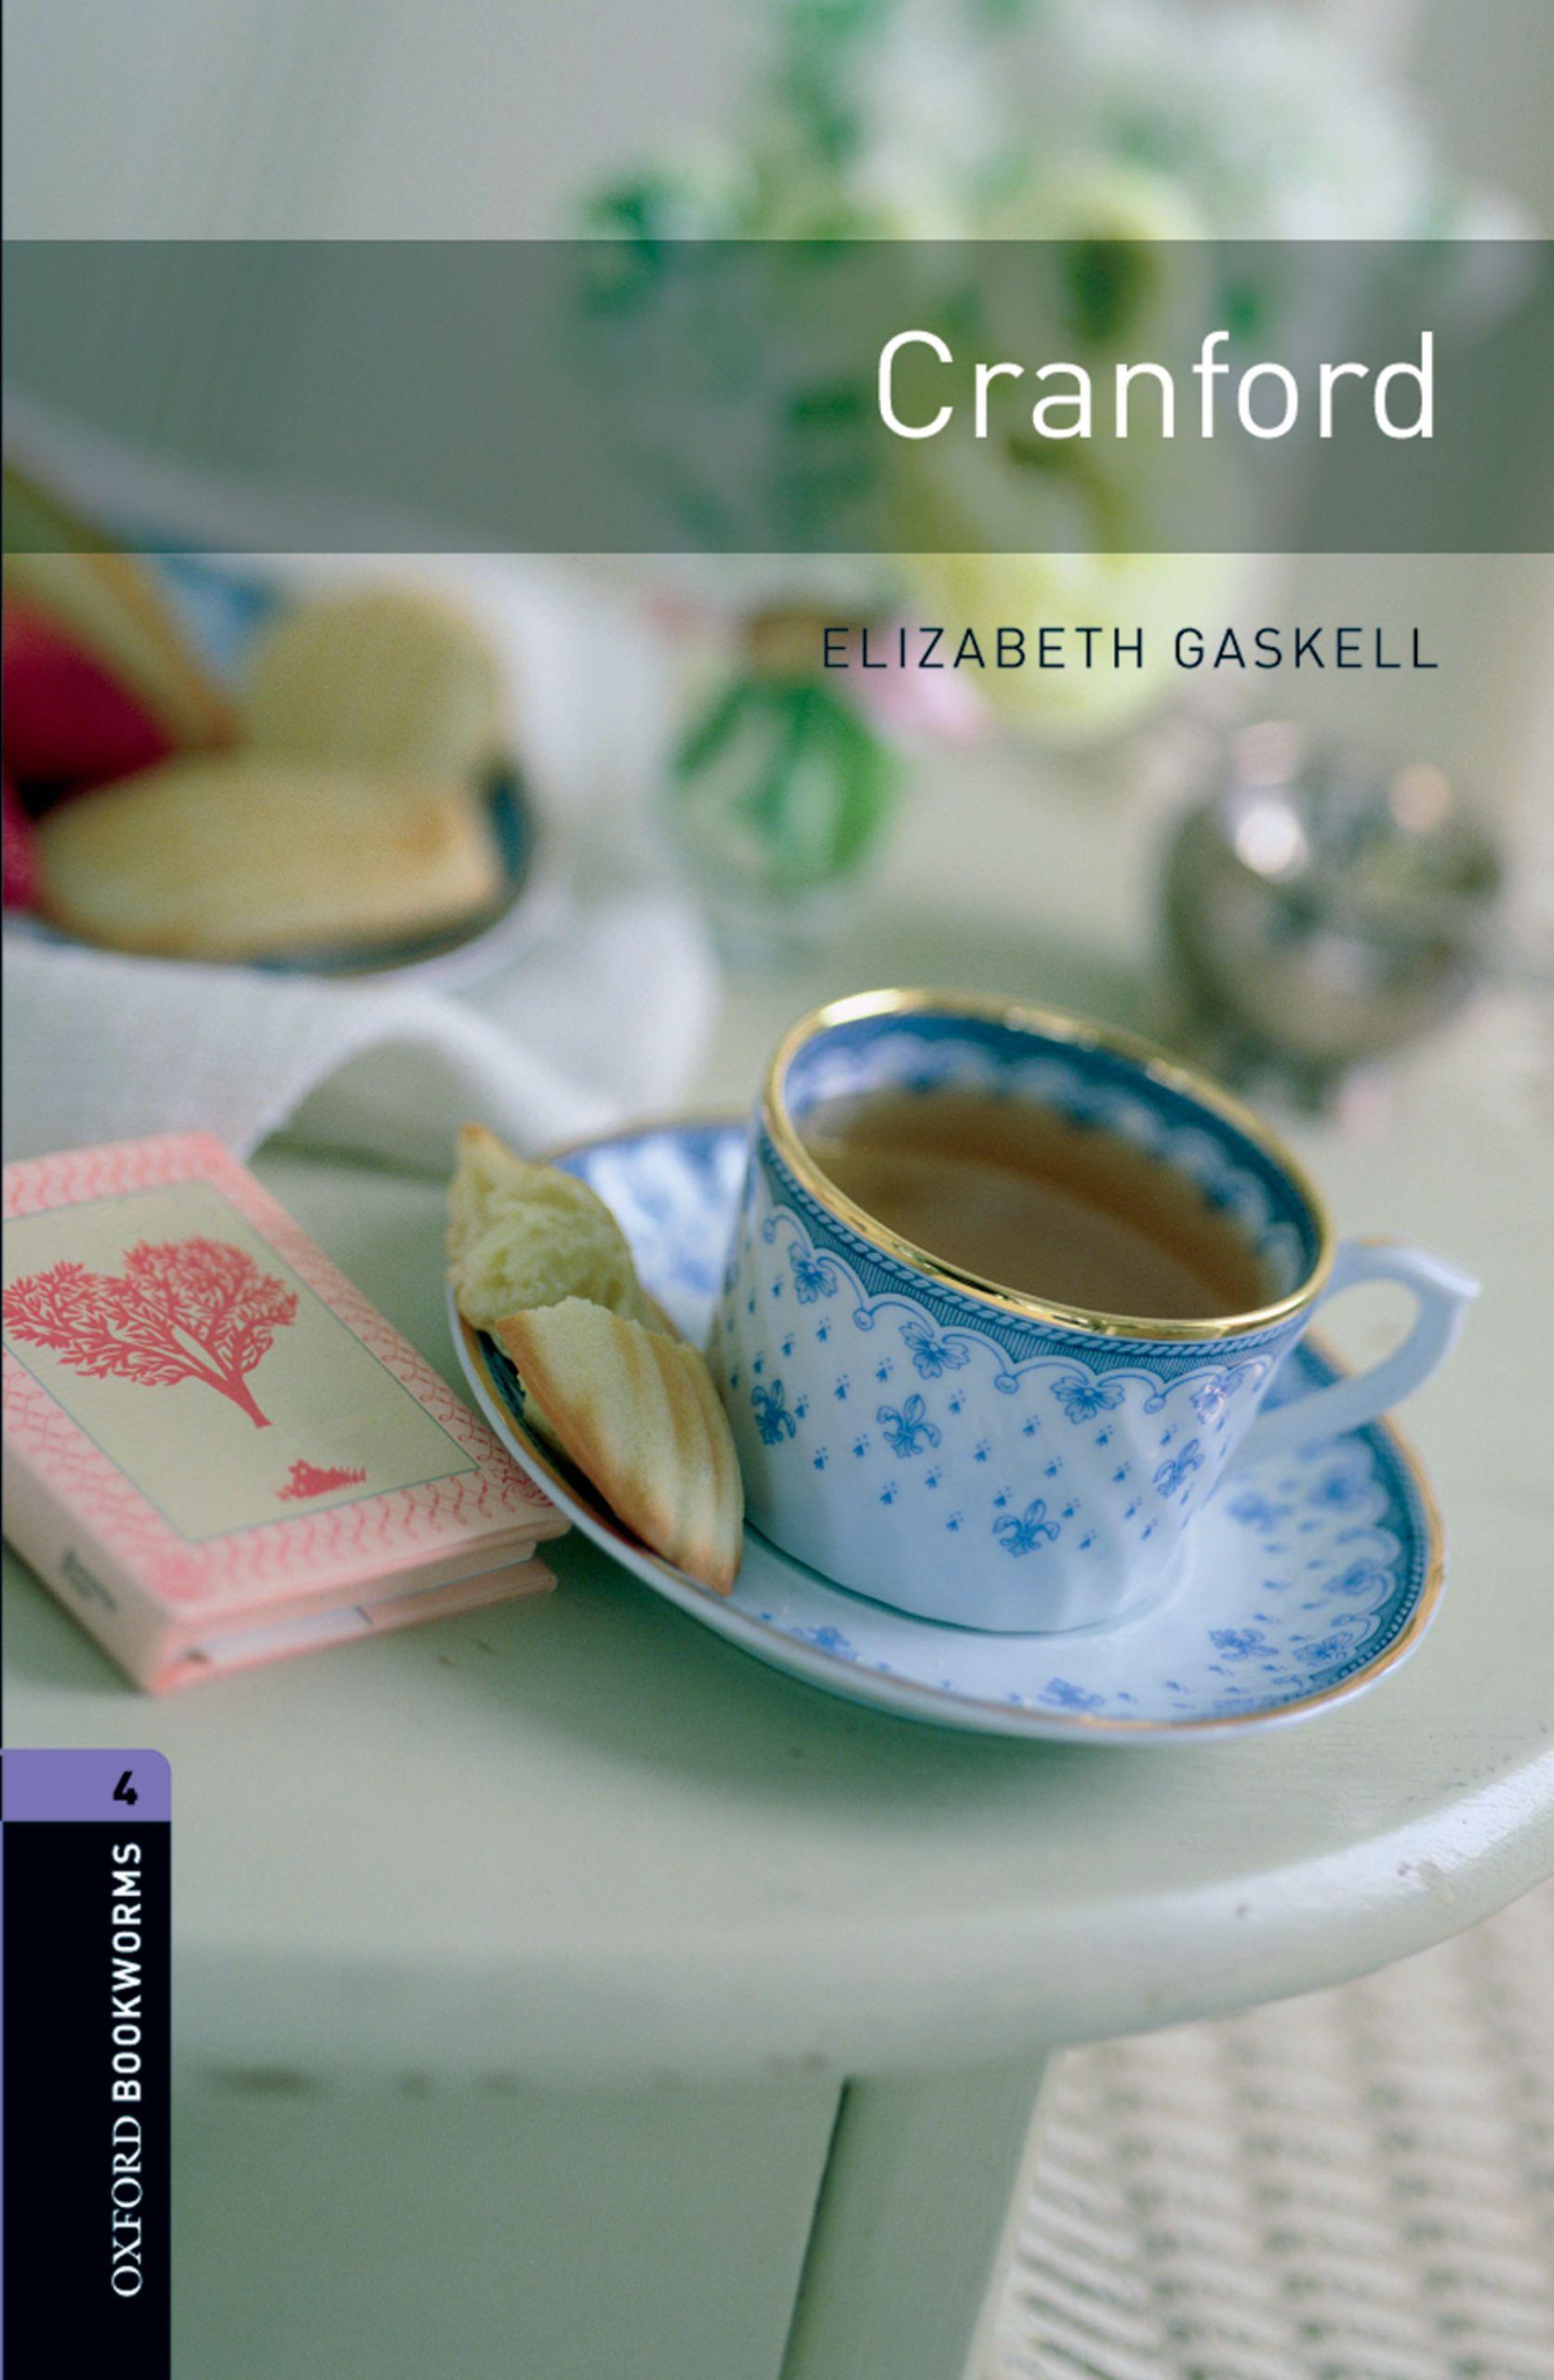 Элизабет Гаскелл Cranford oxford bookworms library stage 4 little women